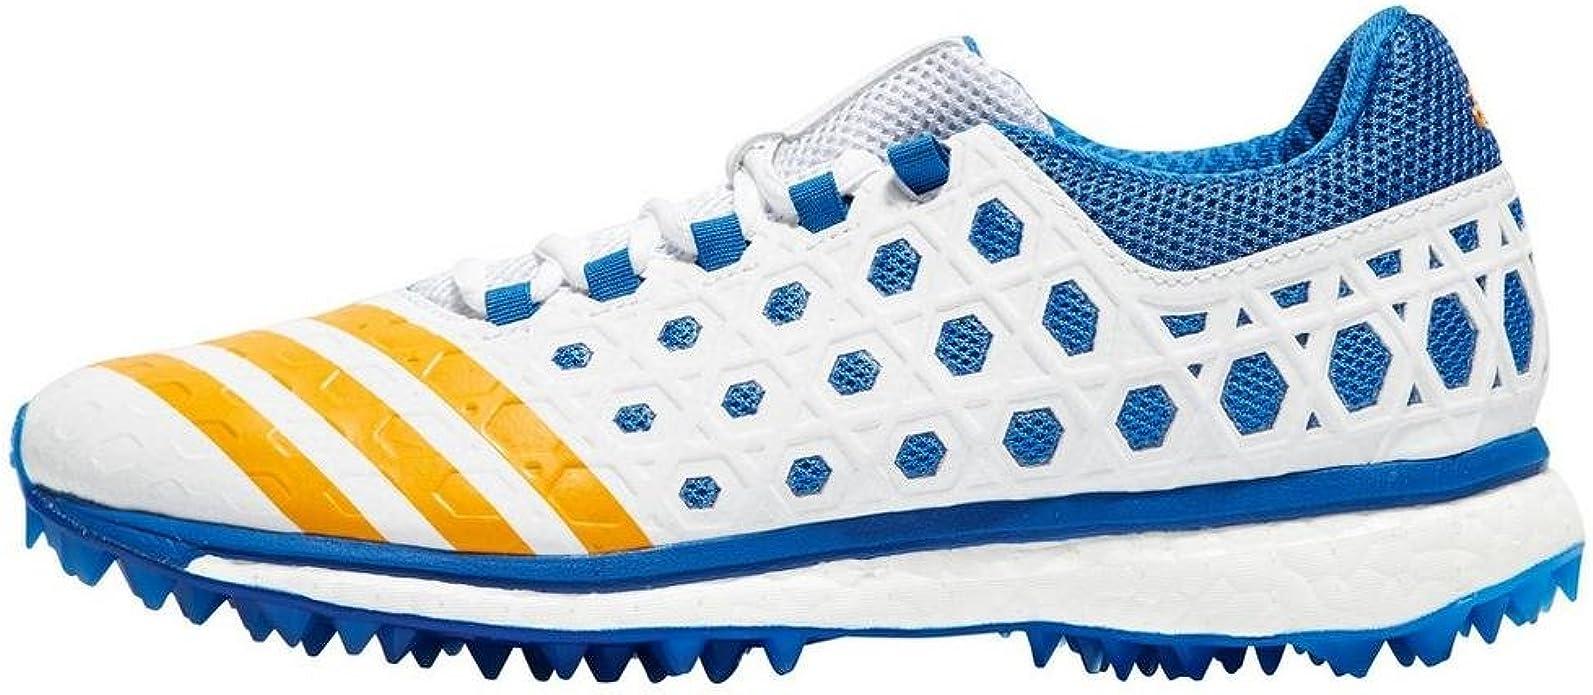 Adidas Adizero Boost SL22 Cricket Shoes